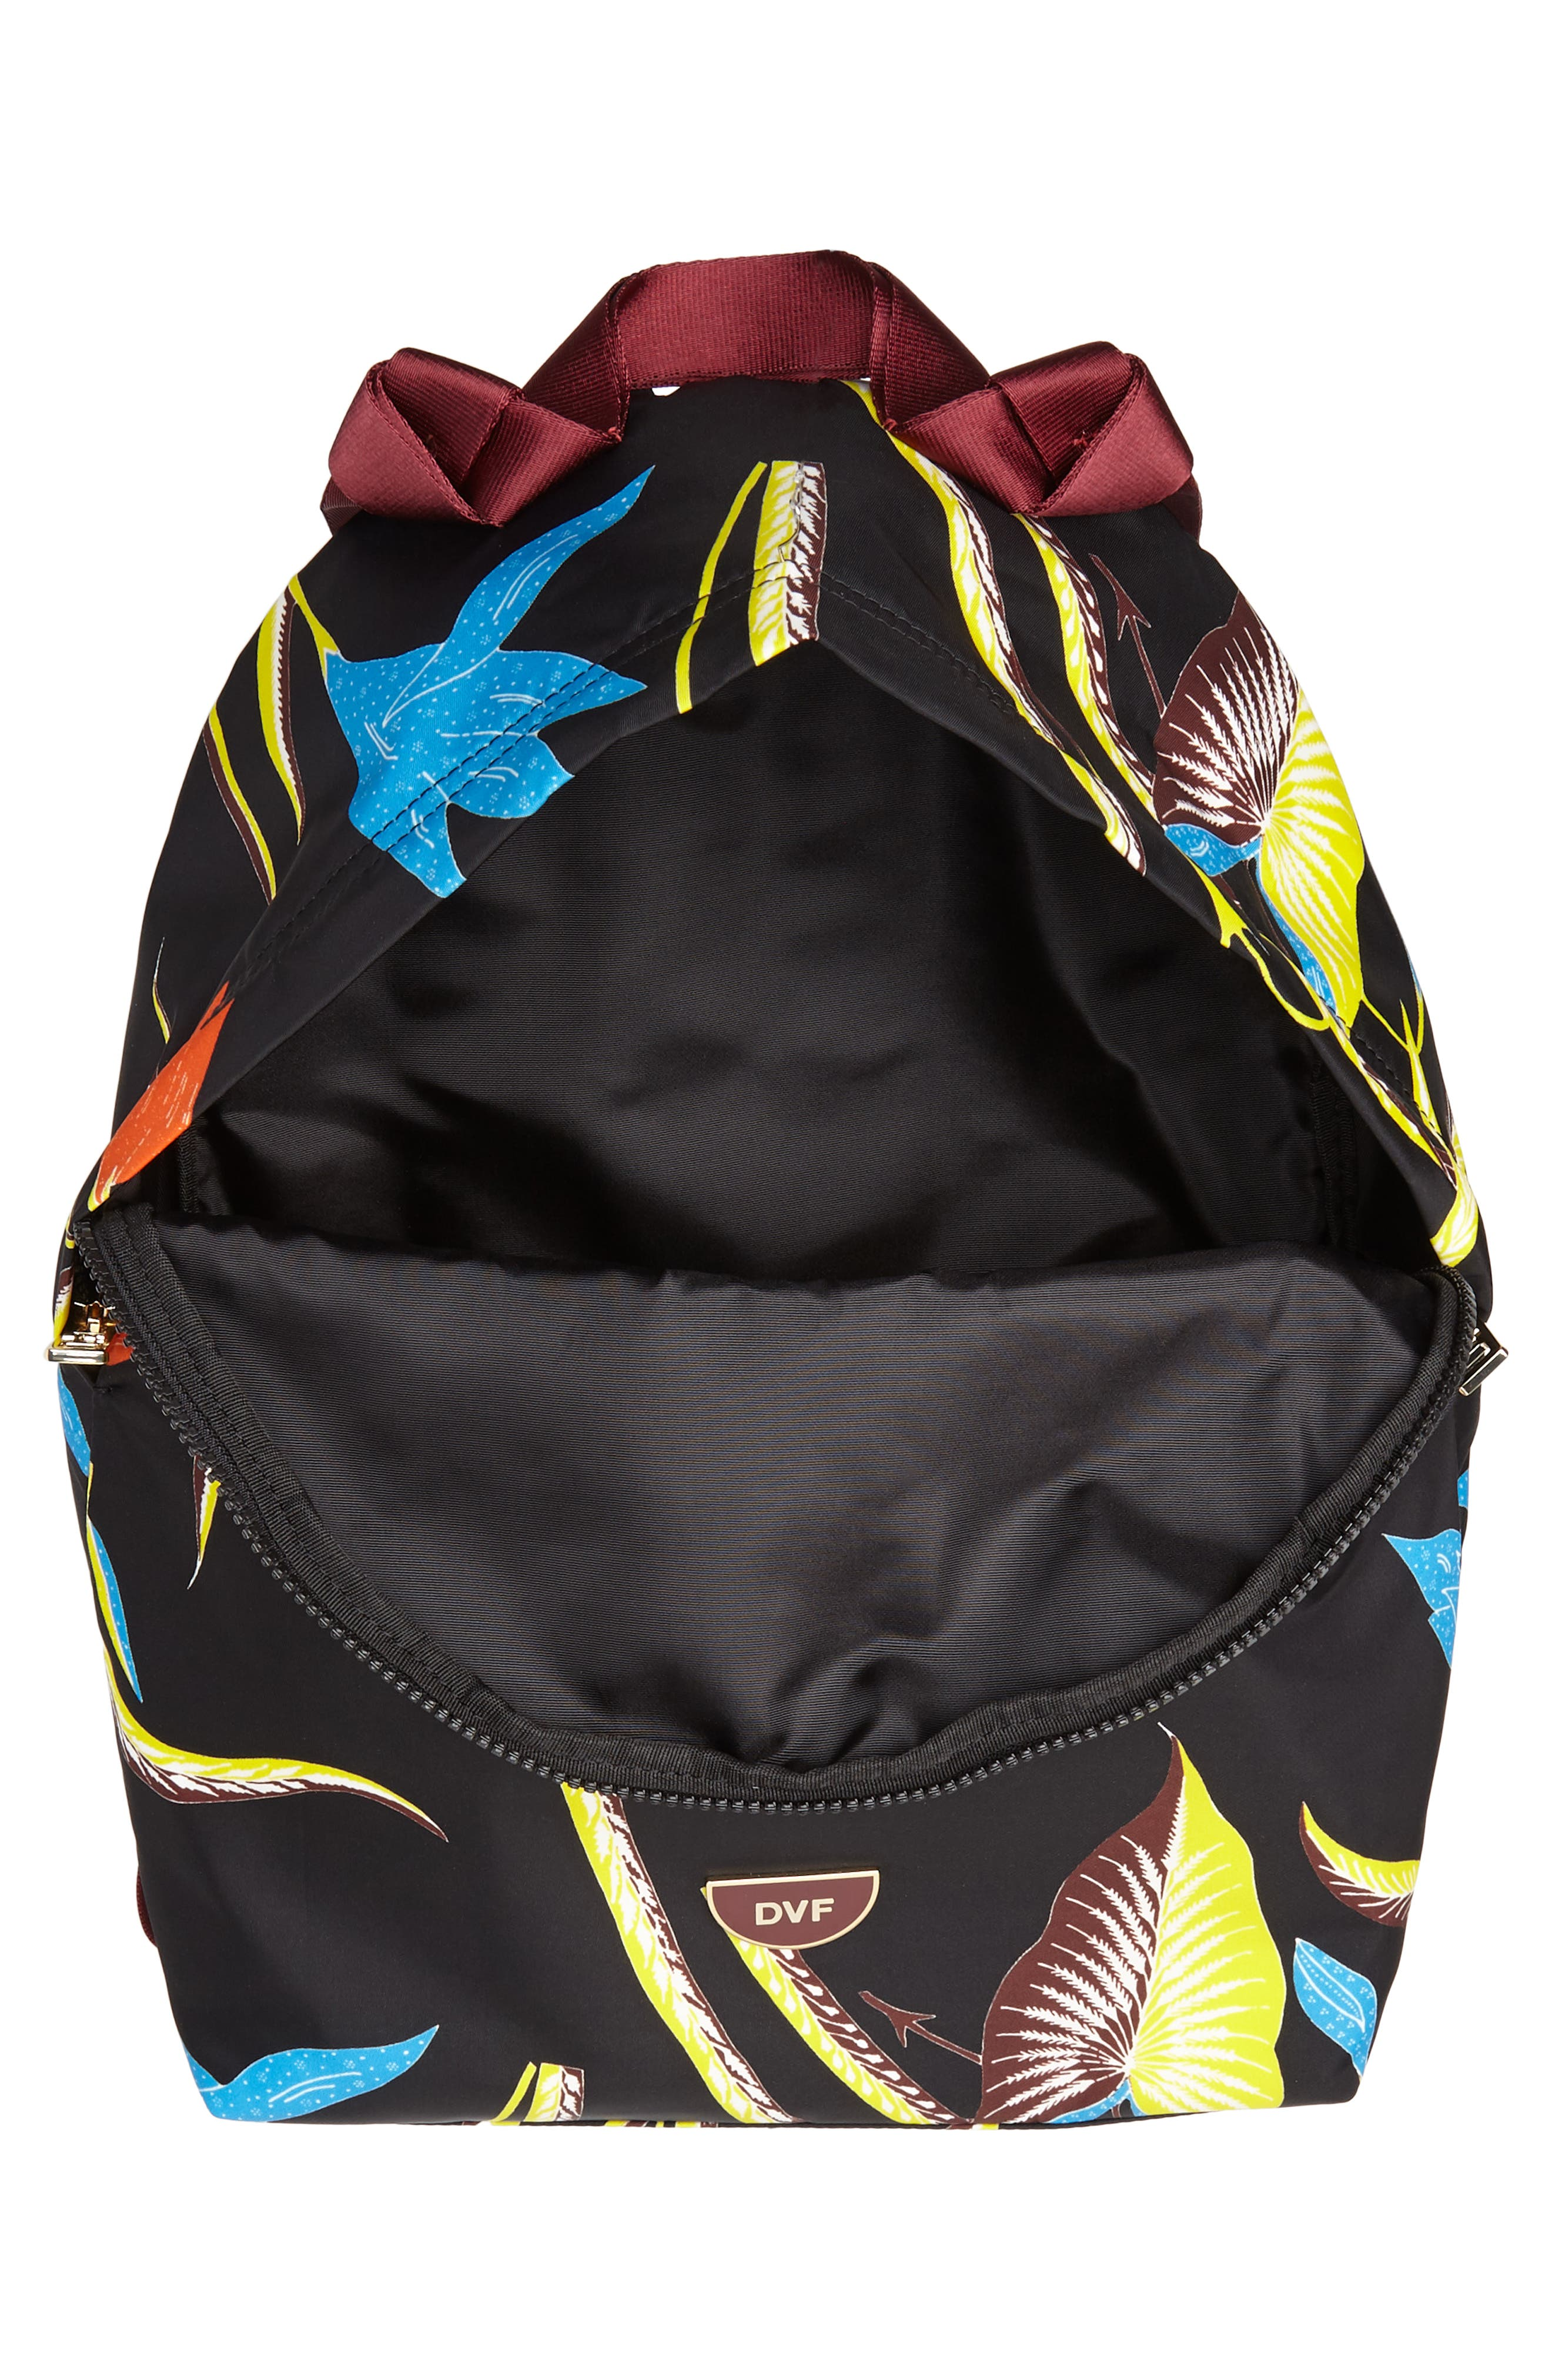 DVF Print Nylon Backpack,                             Alternate thumbnail 4, color,                             OSWALD BLACK